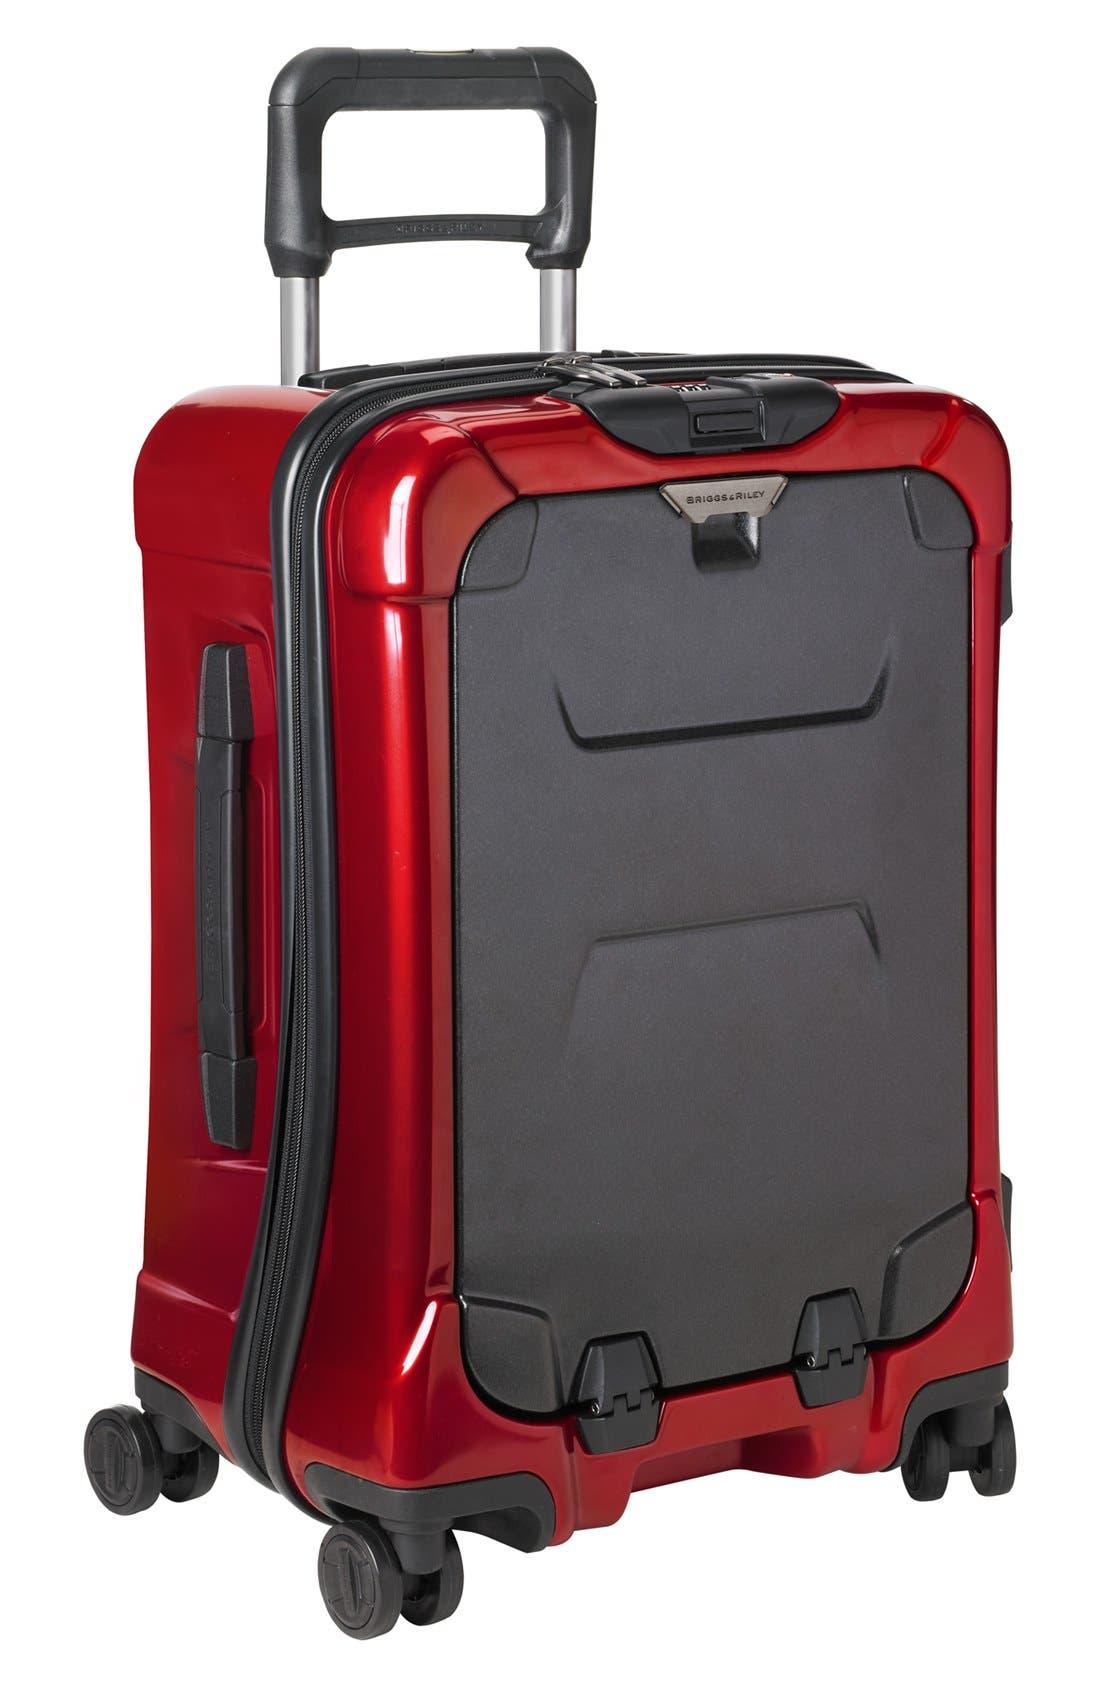 Briggs & Riley 'Torq International' Hard Shell Spinner Carry-On (20 Inch)